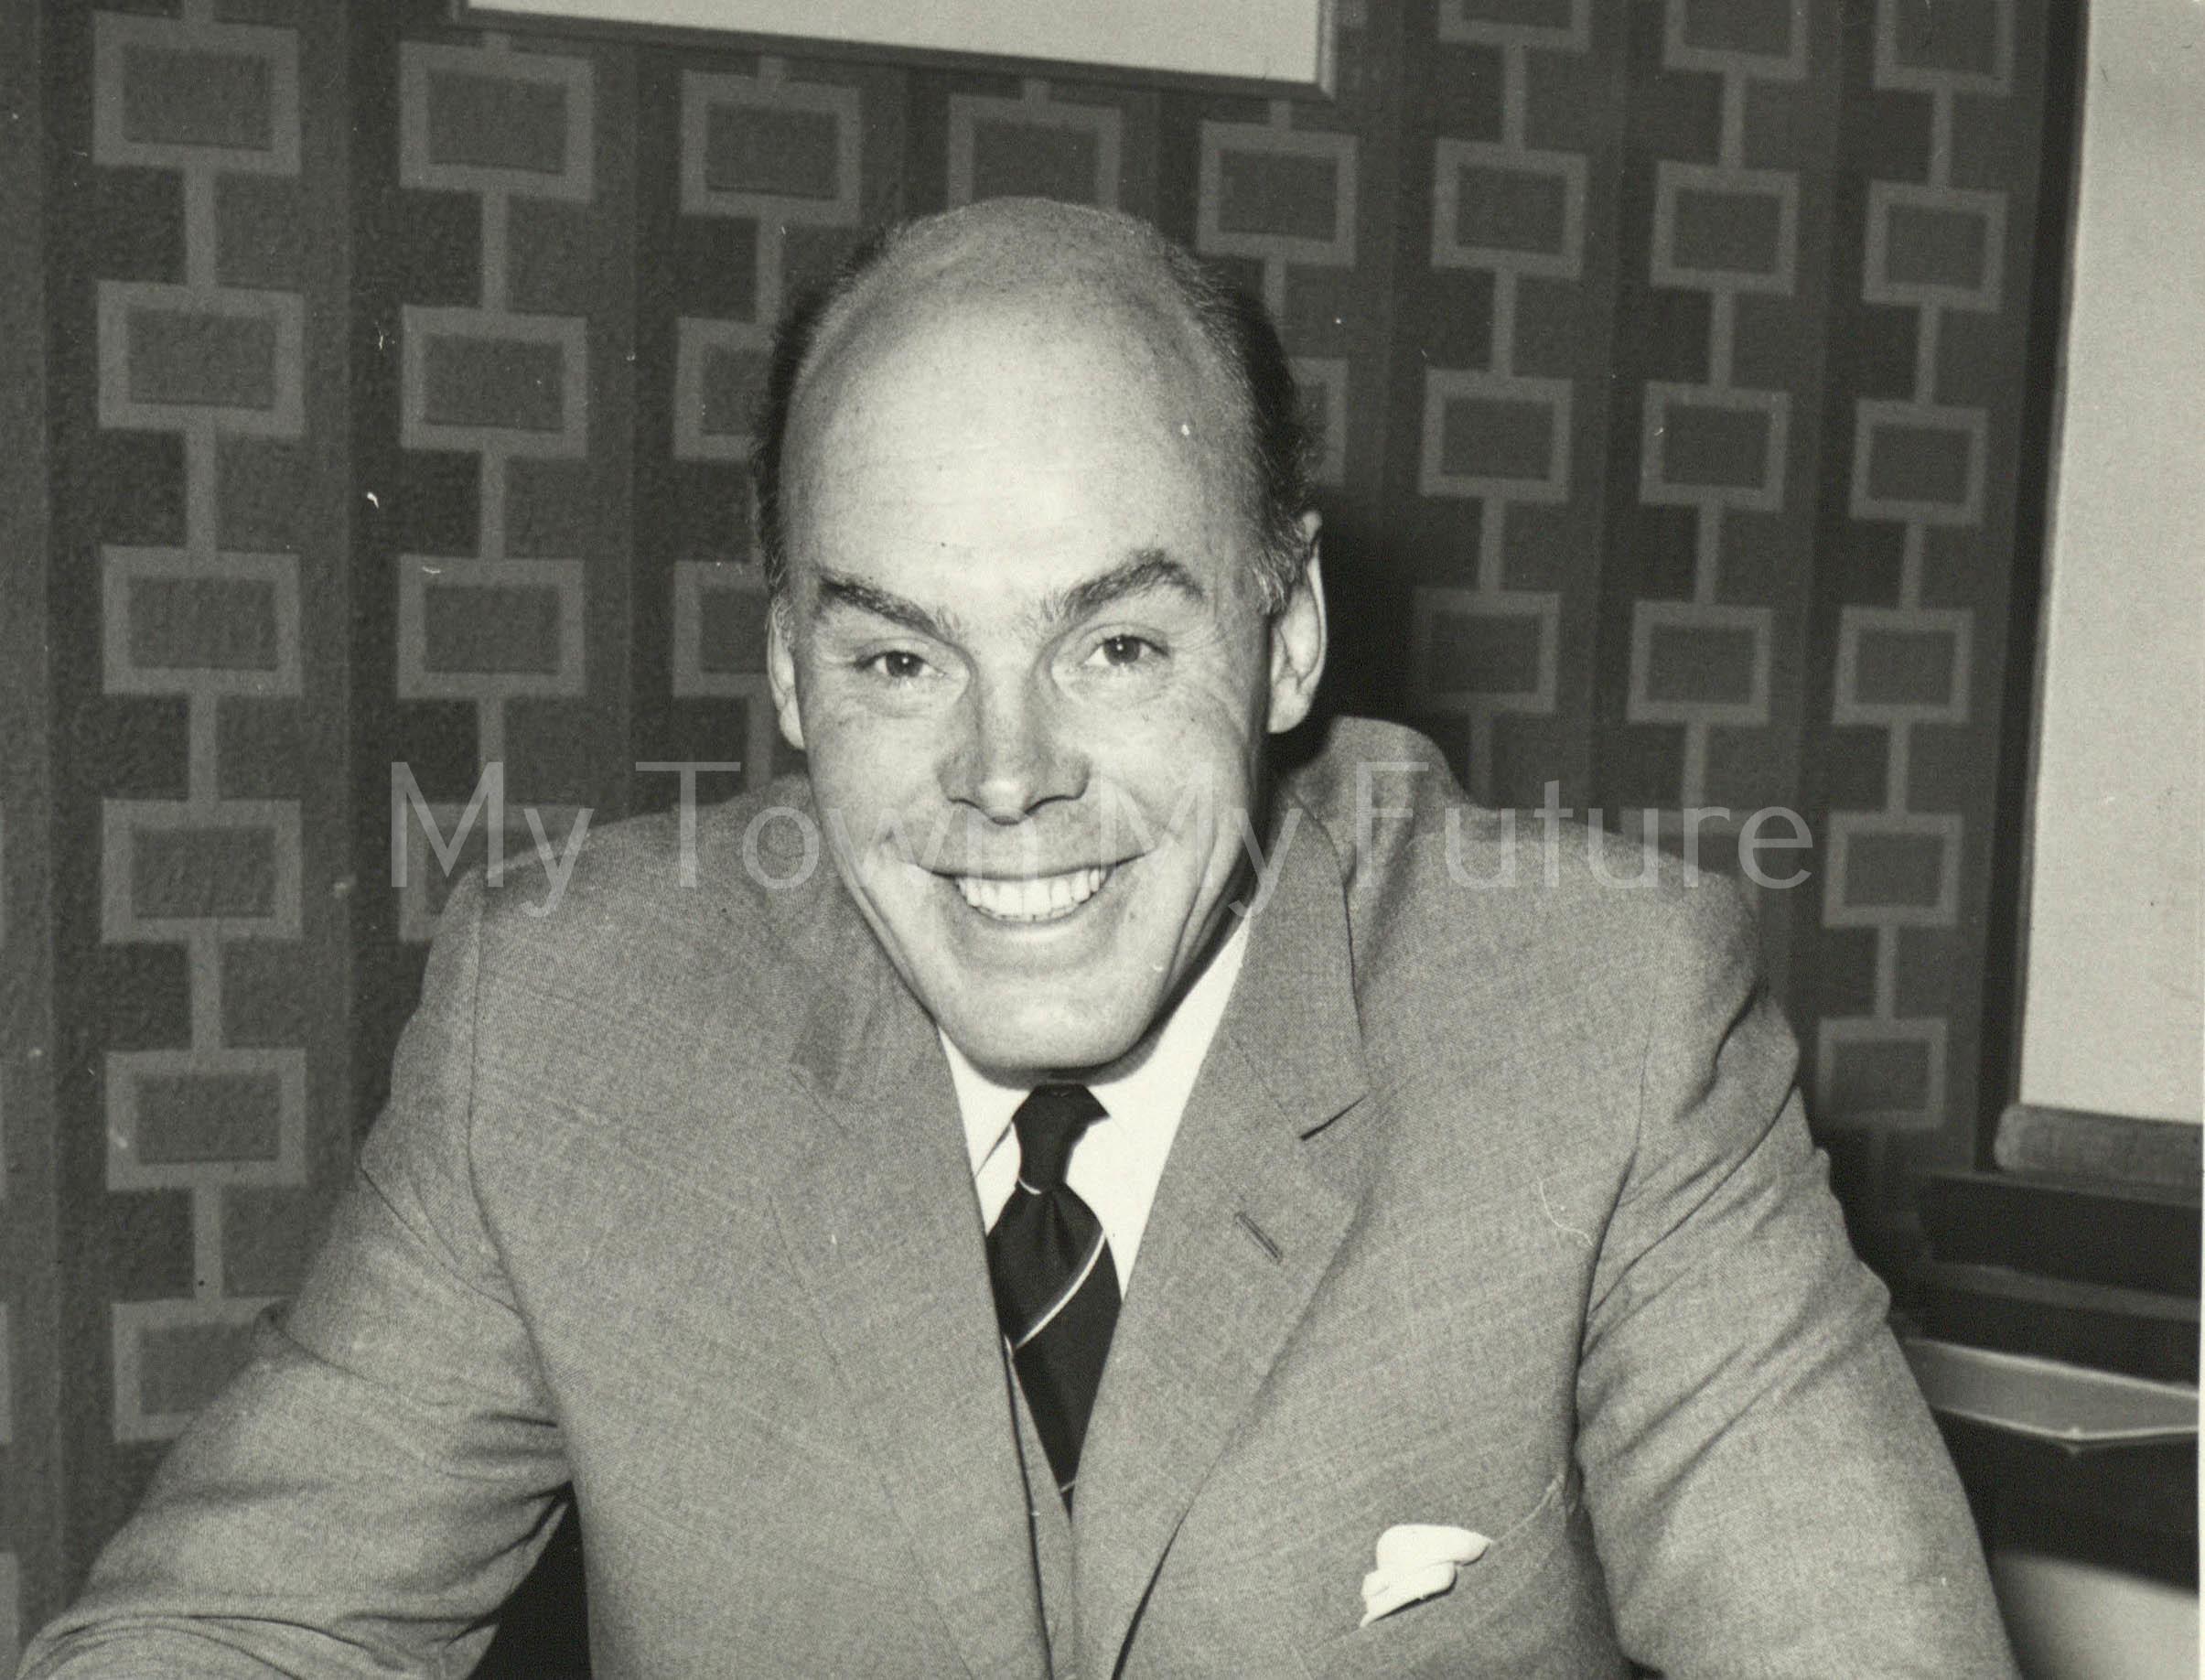 Nigel Moir_8 July 1966_Industrial Pictorial Services